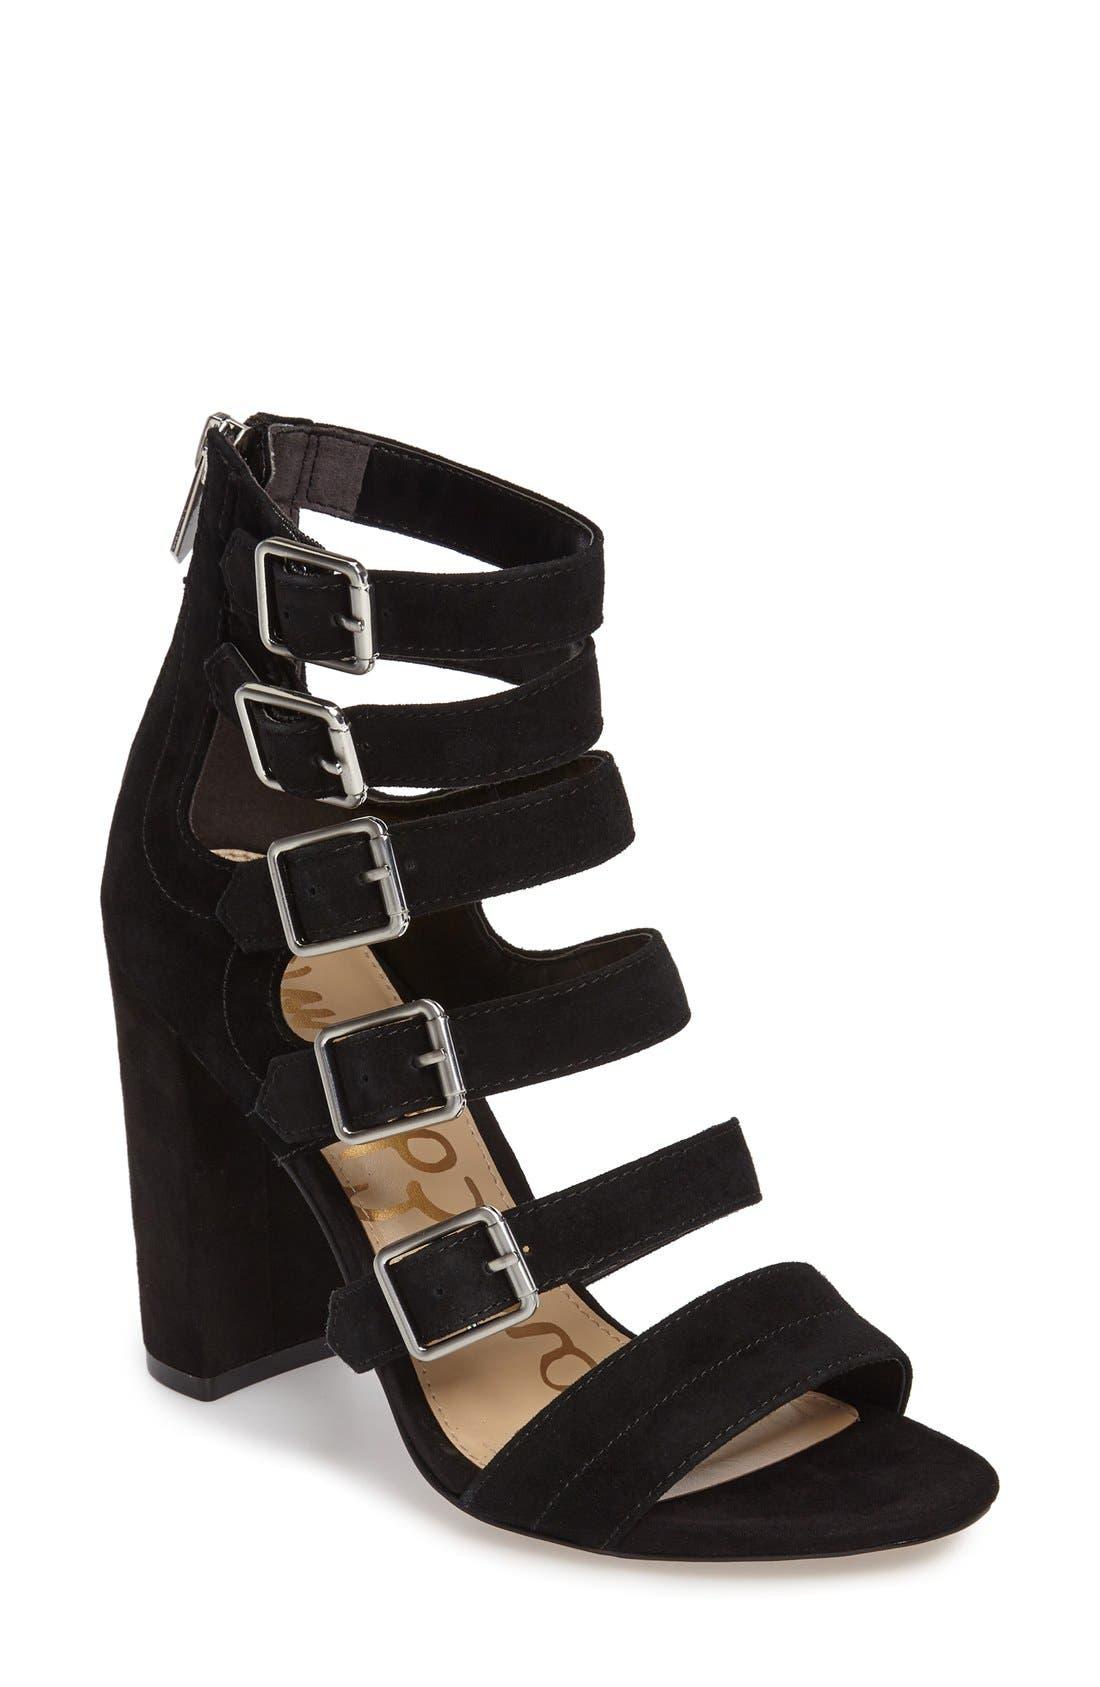 Main Image - Sam Edelman Yasmina Buckle Strap Gladiator Sandal (Women)